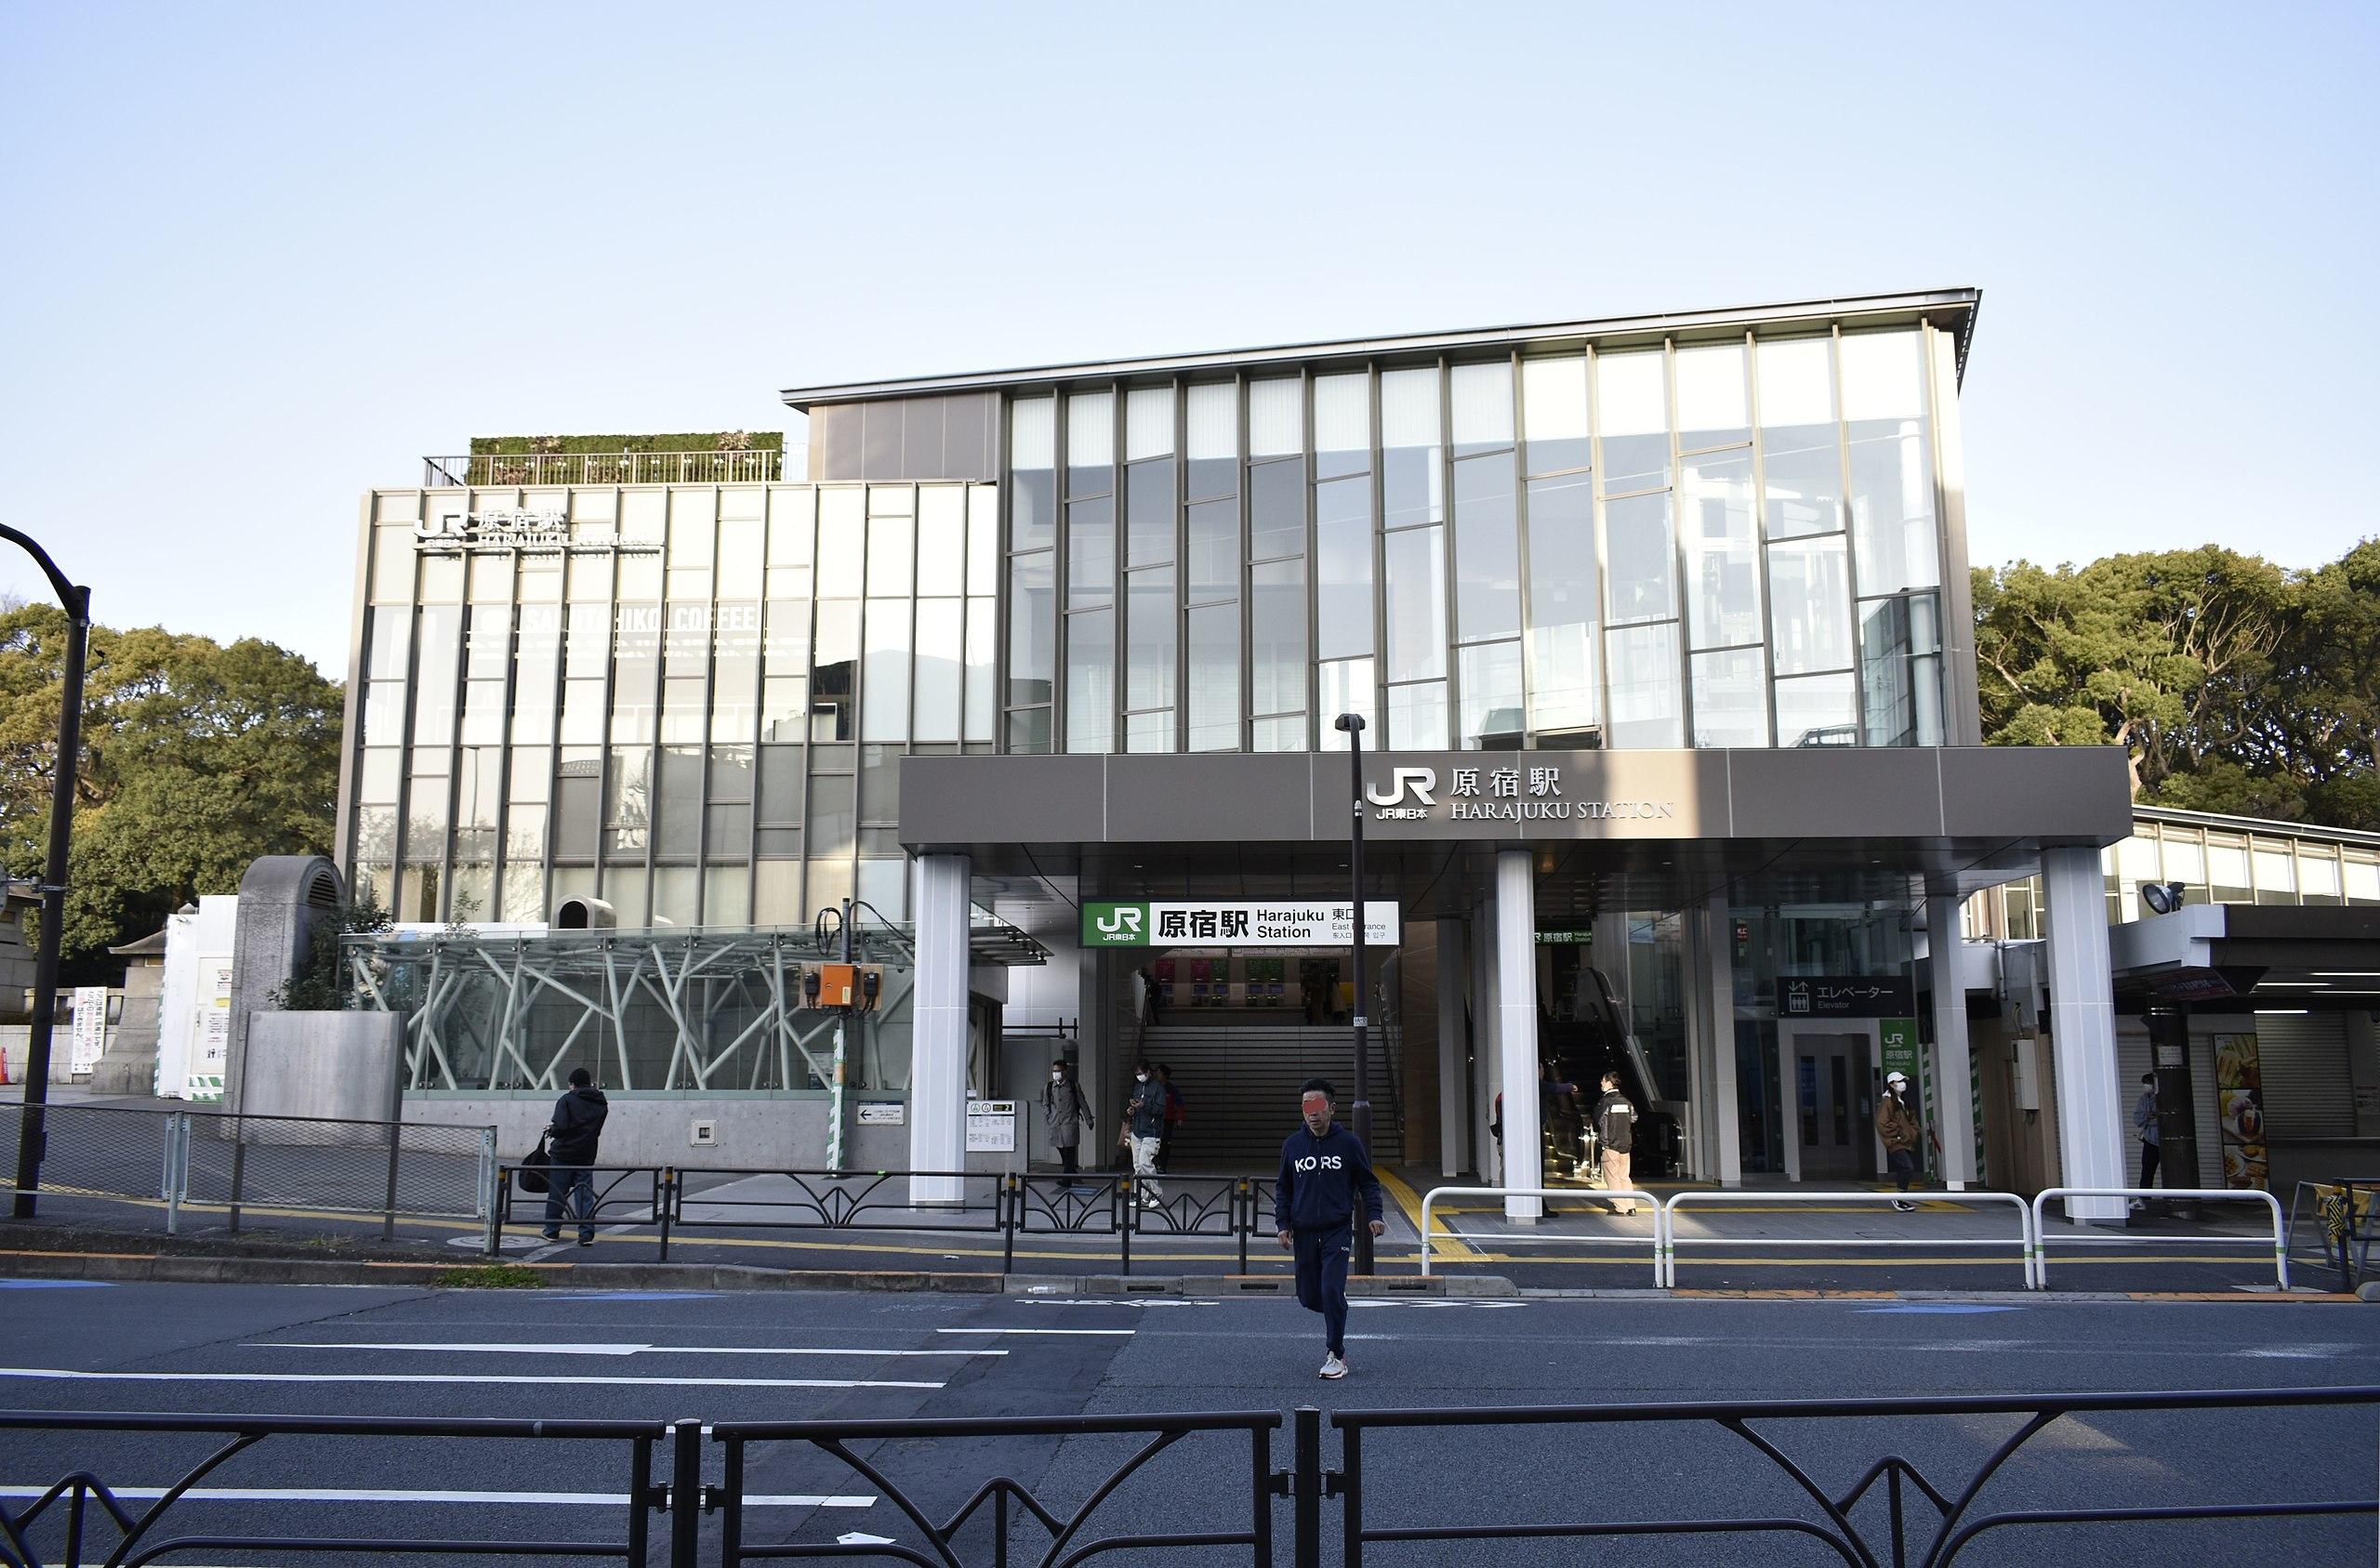 Harajuku Station 200321a2.jpg